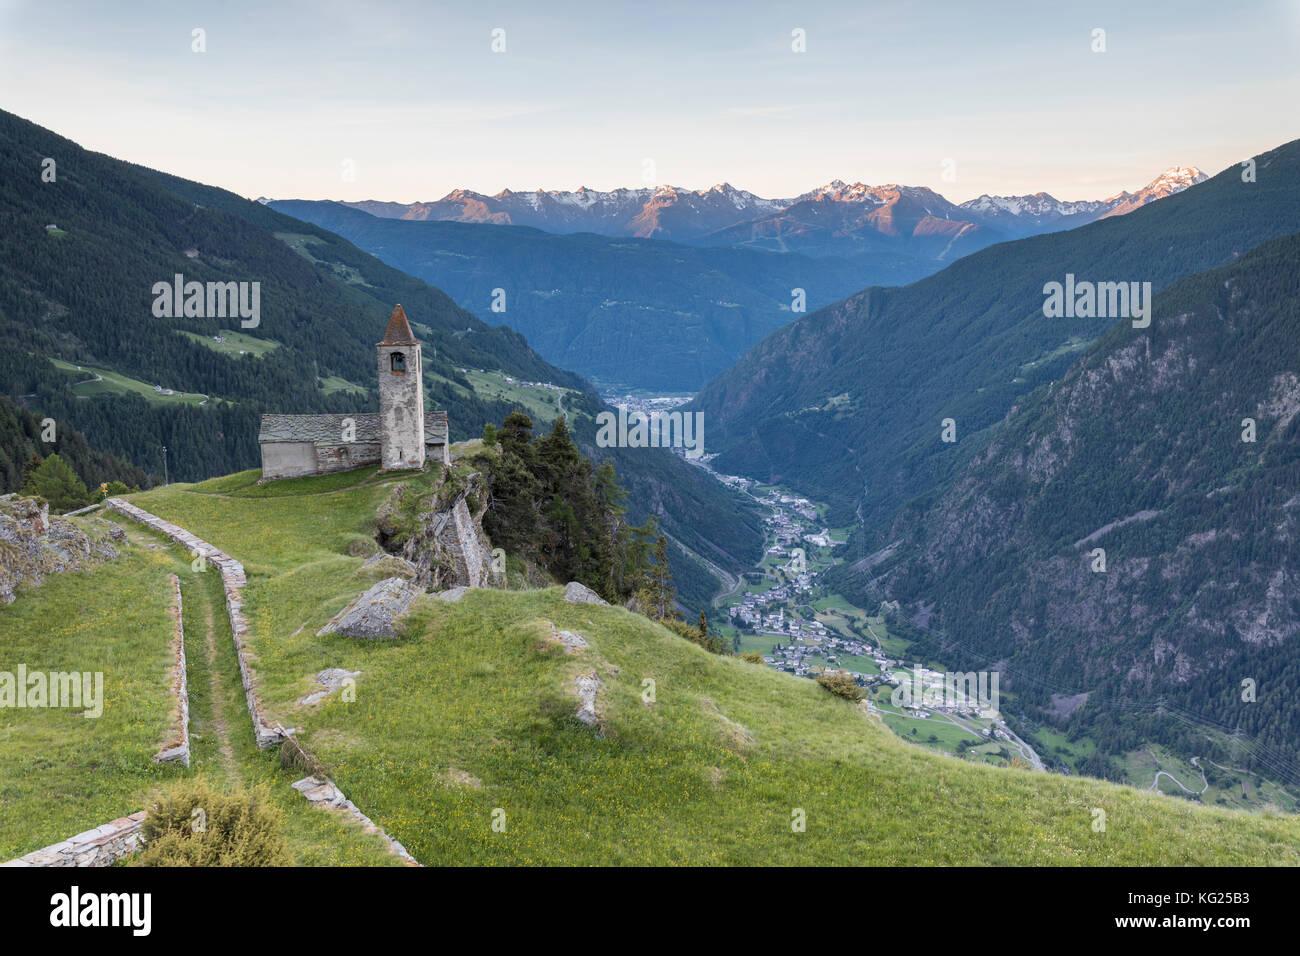 Ancient church at sunrise, San Romerio Alp, Brusio, Canton of Graubunden, Poschiavo Valley, Switzerland, Europe - Stock Image